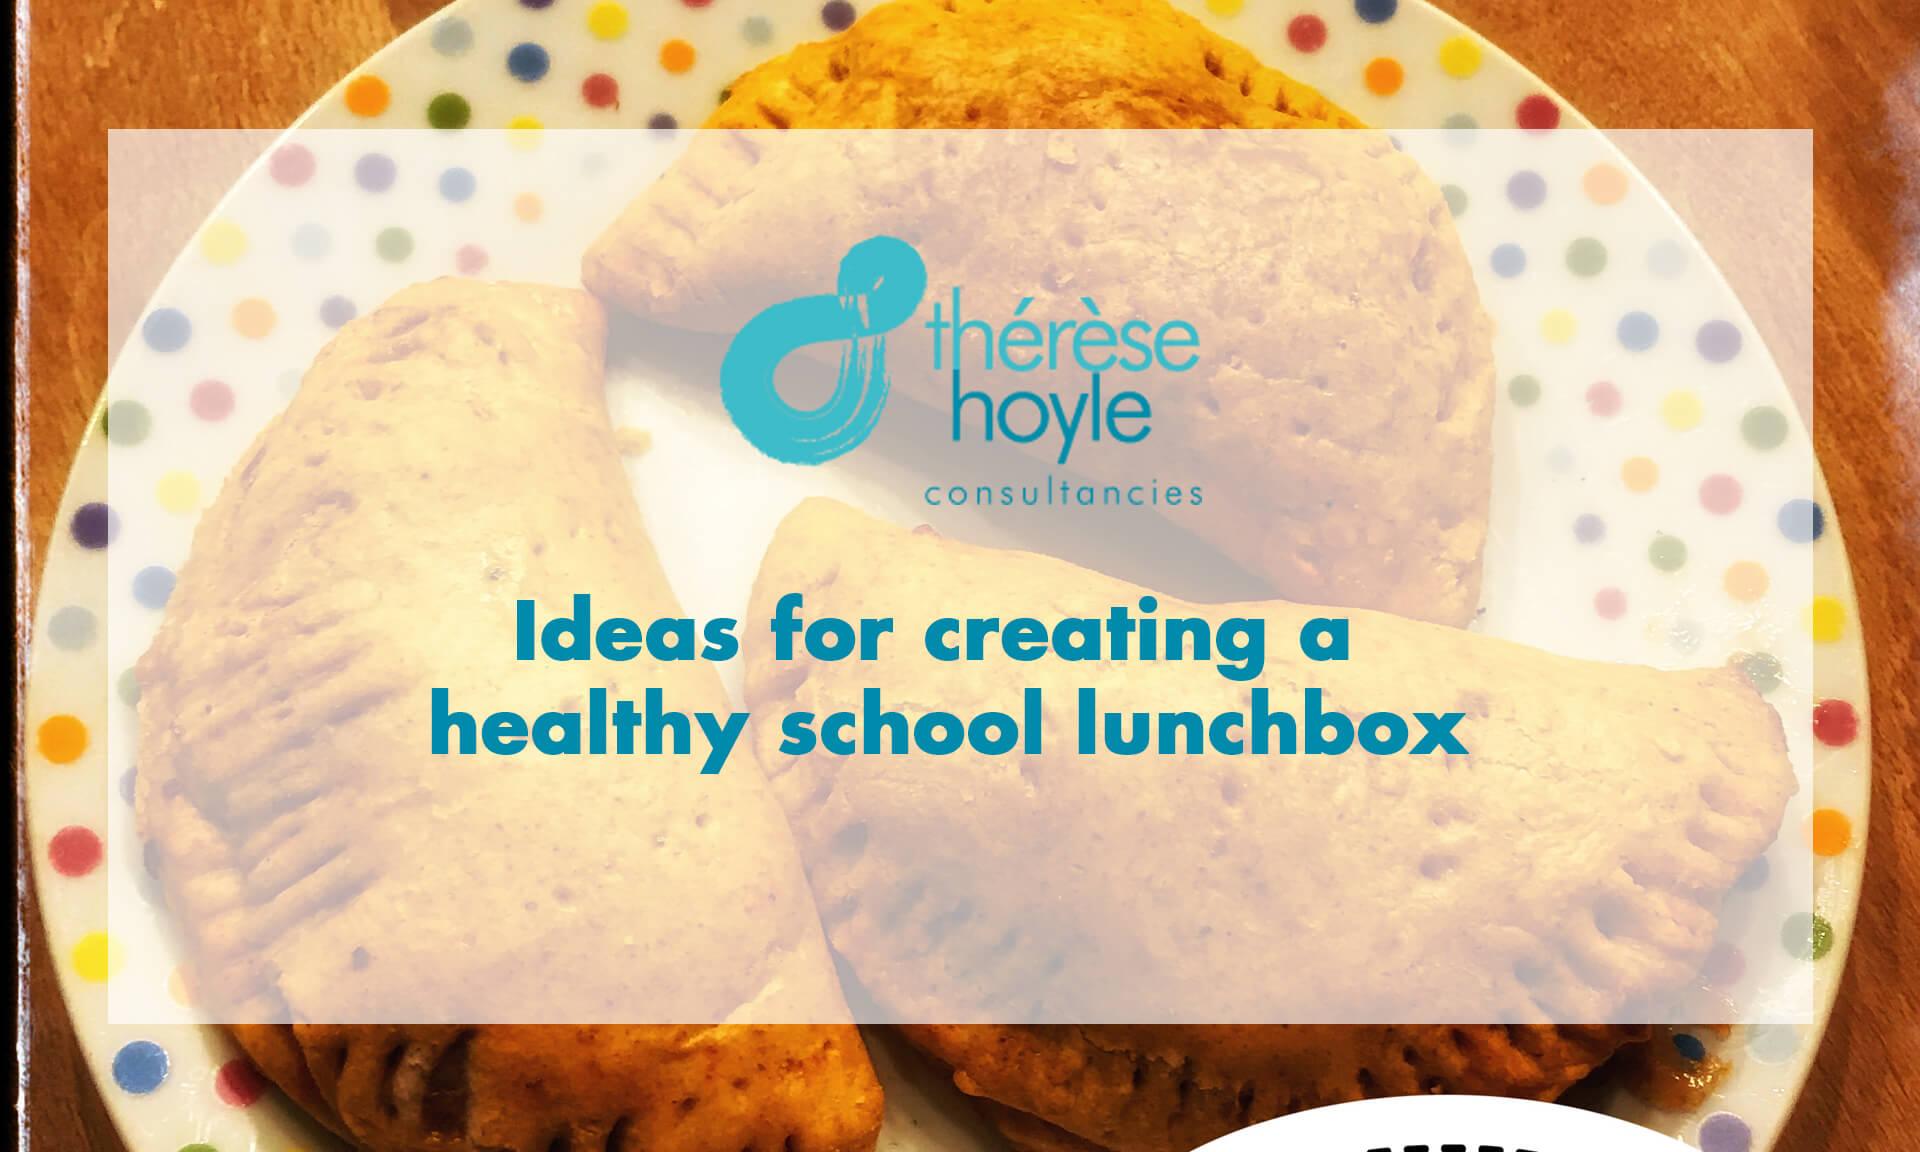 Ideas for creating a healthy school lunchbox